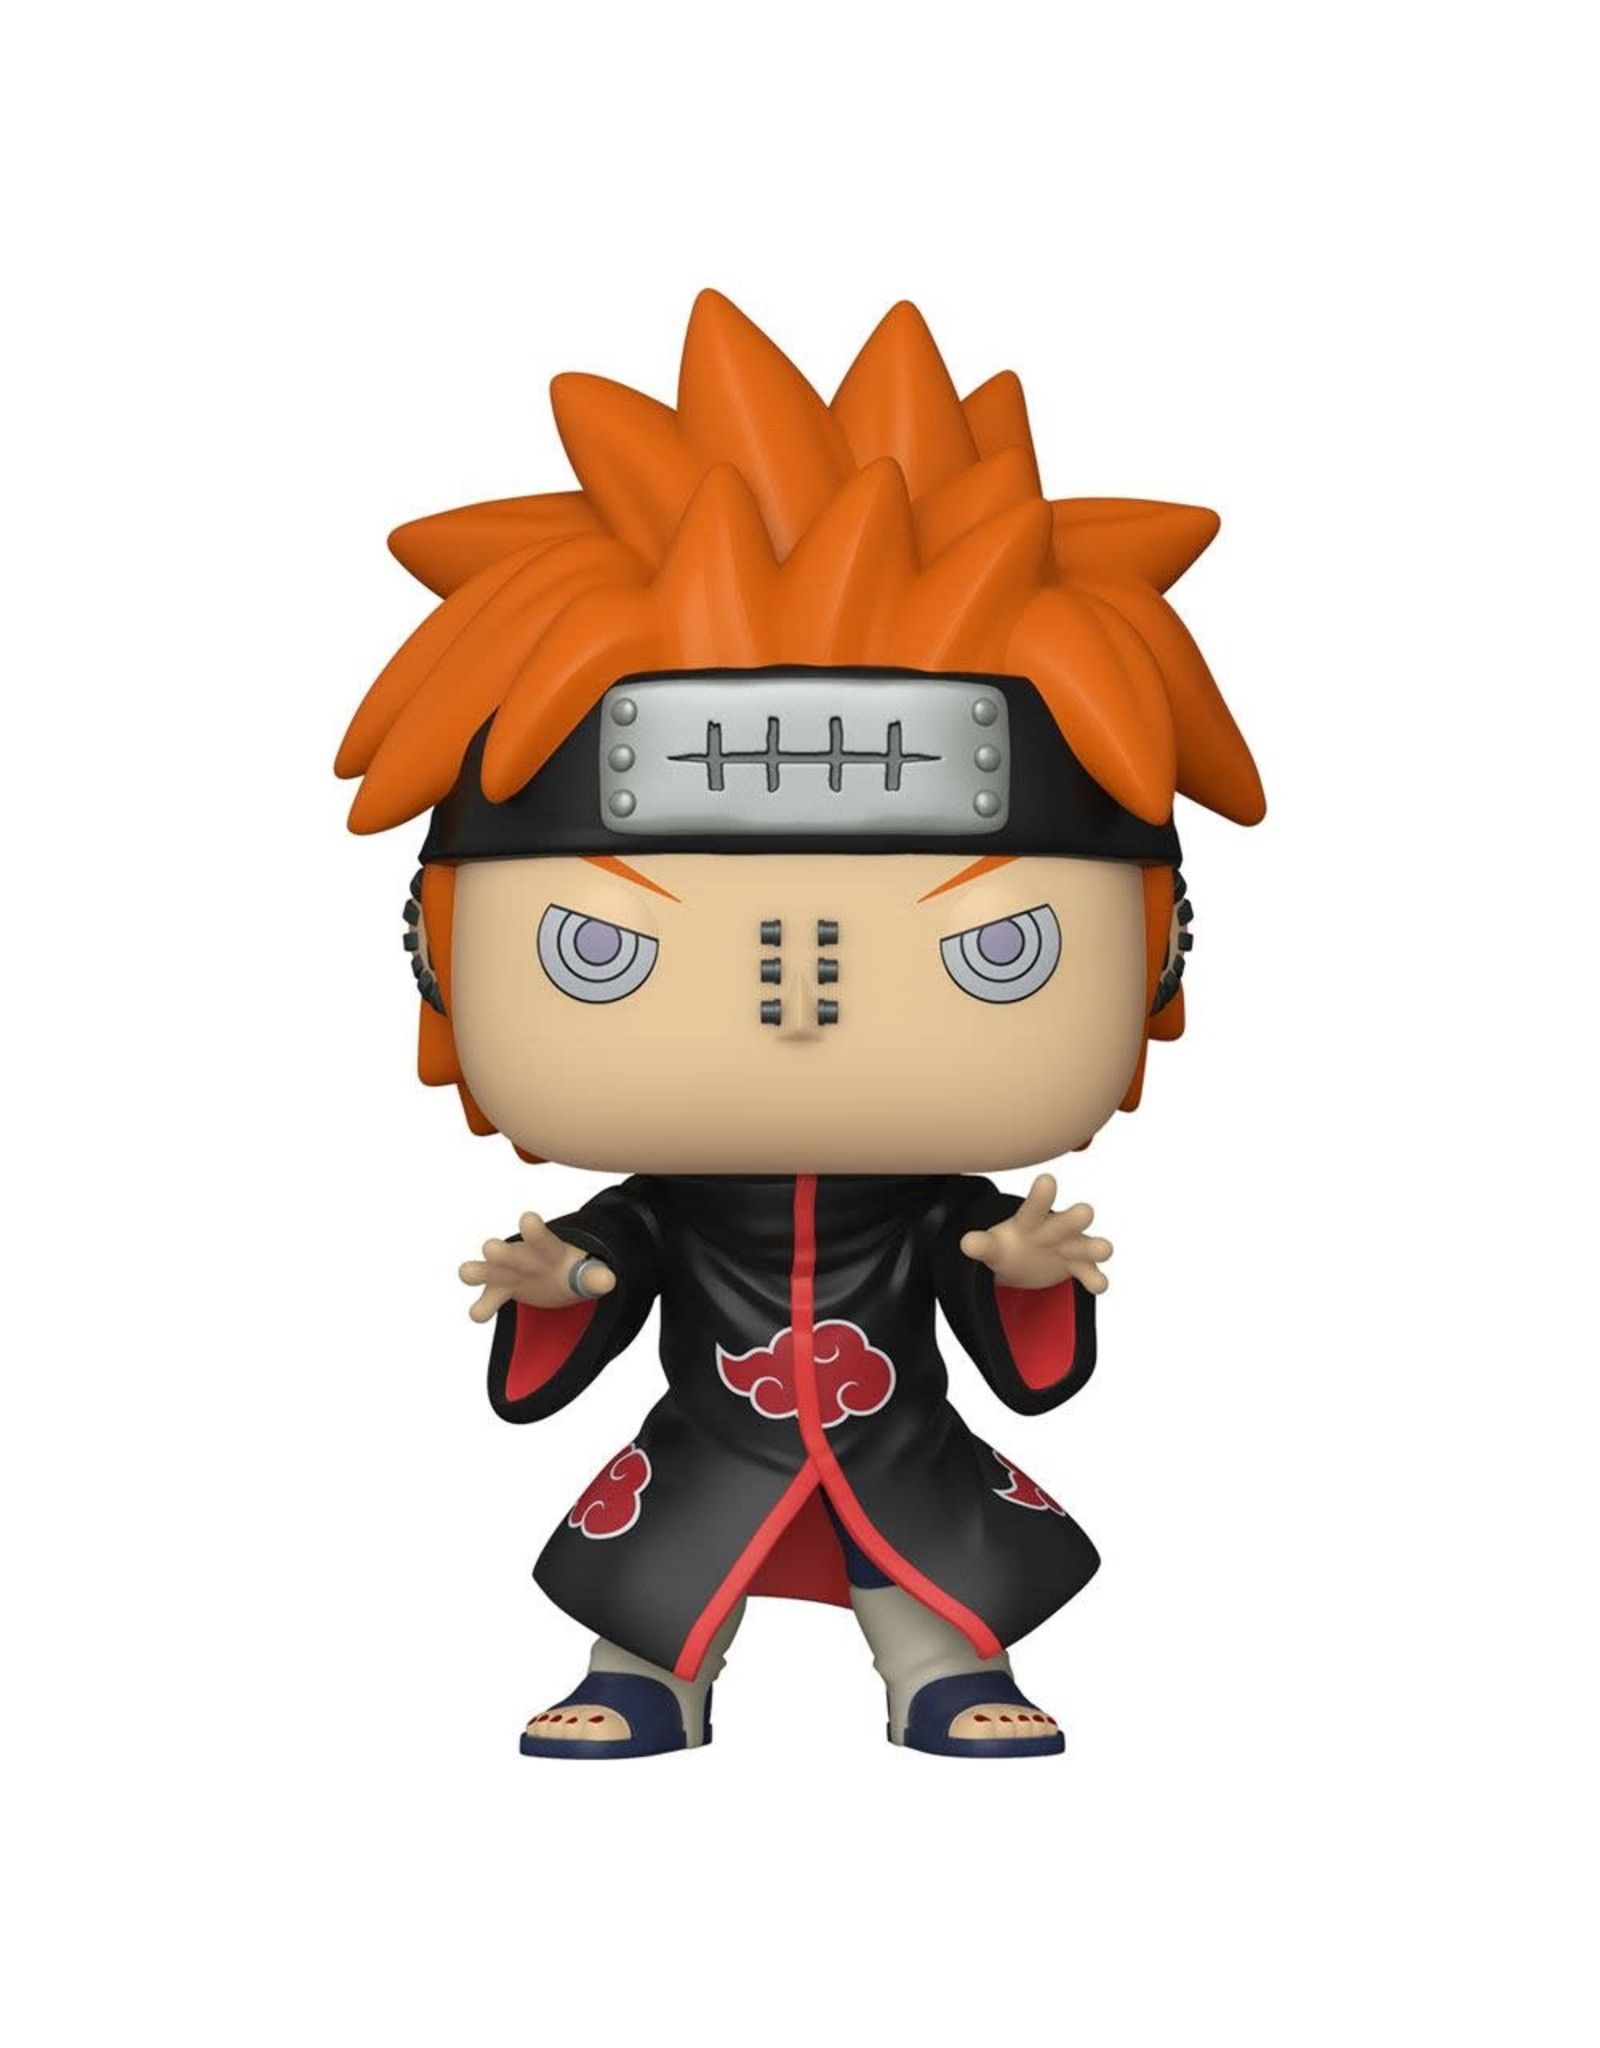 Naruto Shippuden - Pain - Funko Pop! Animation 934